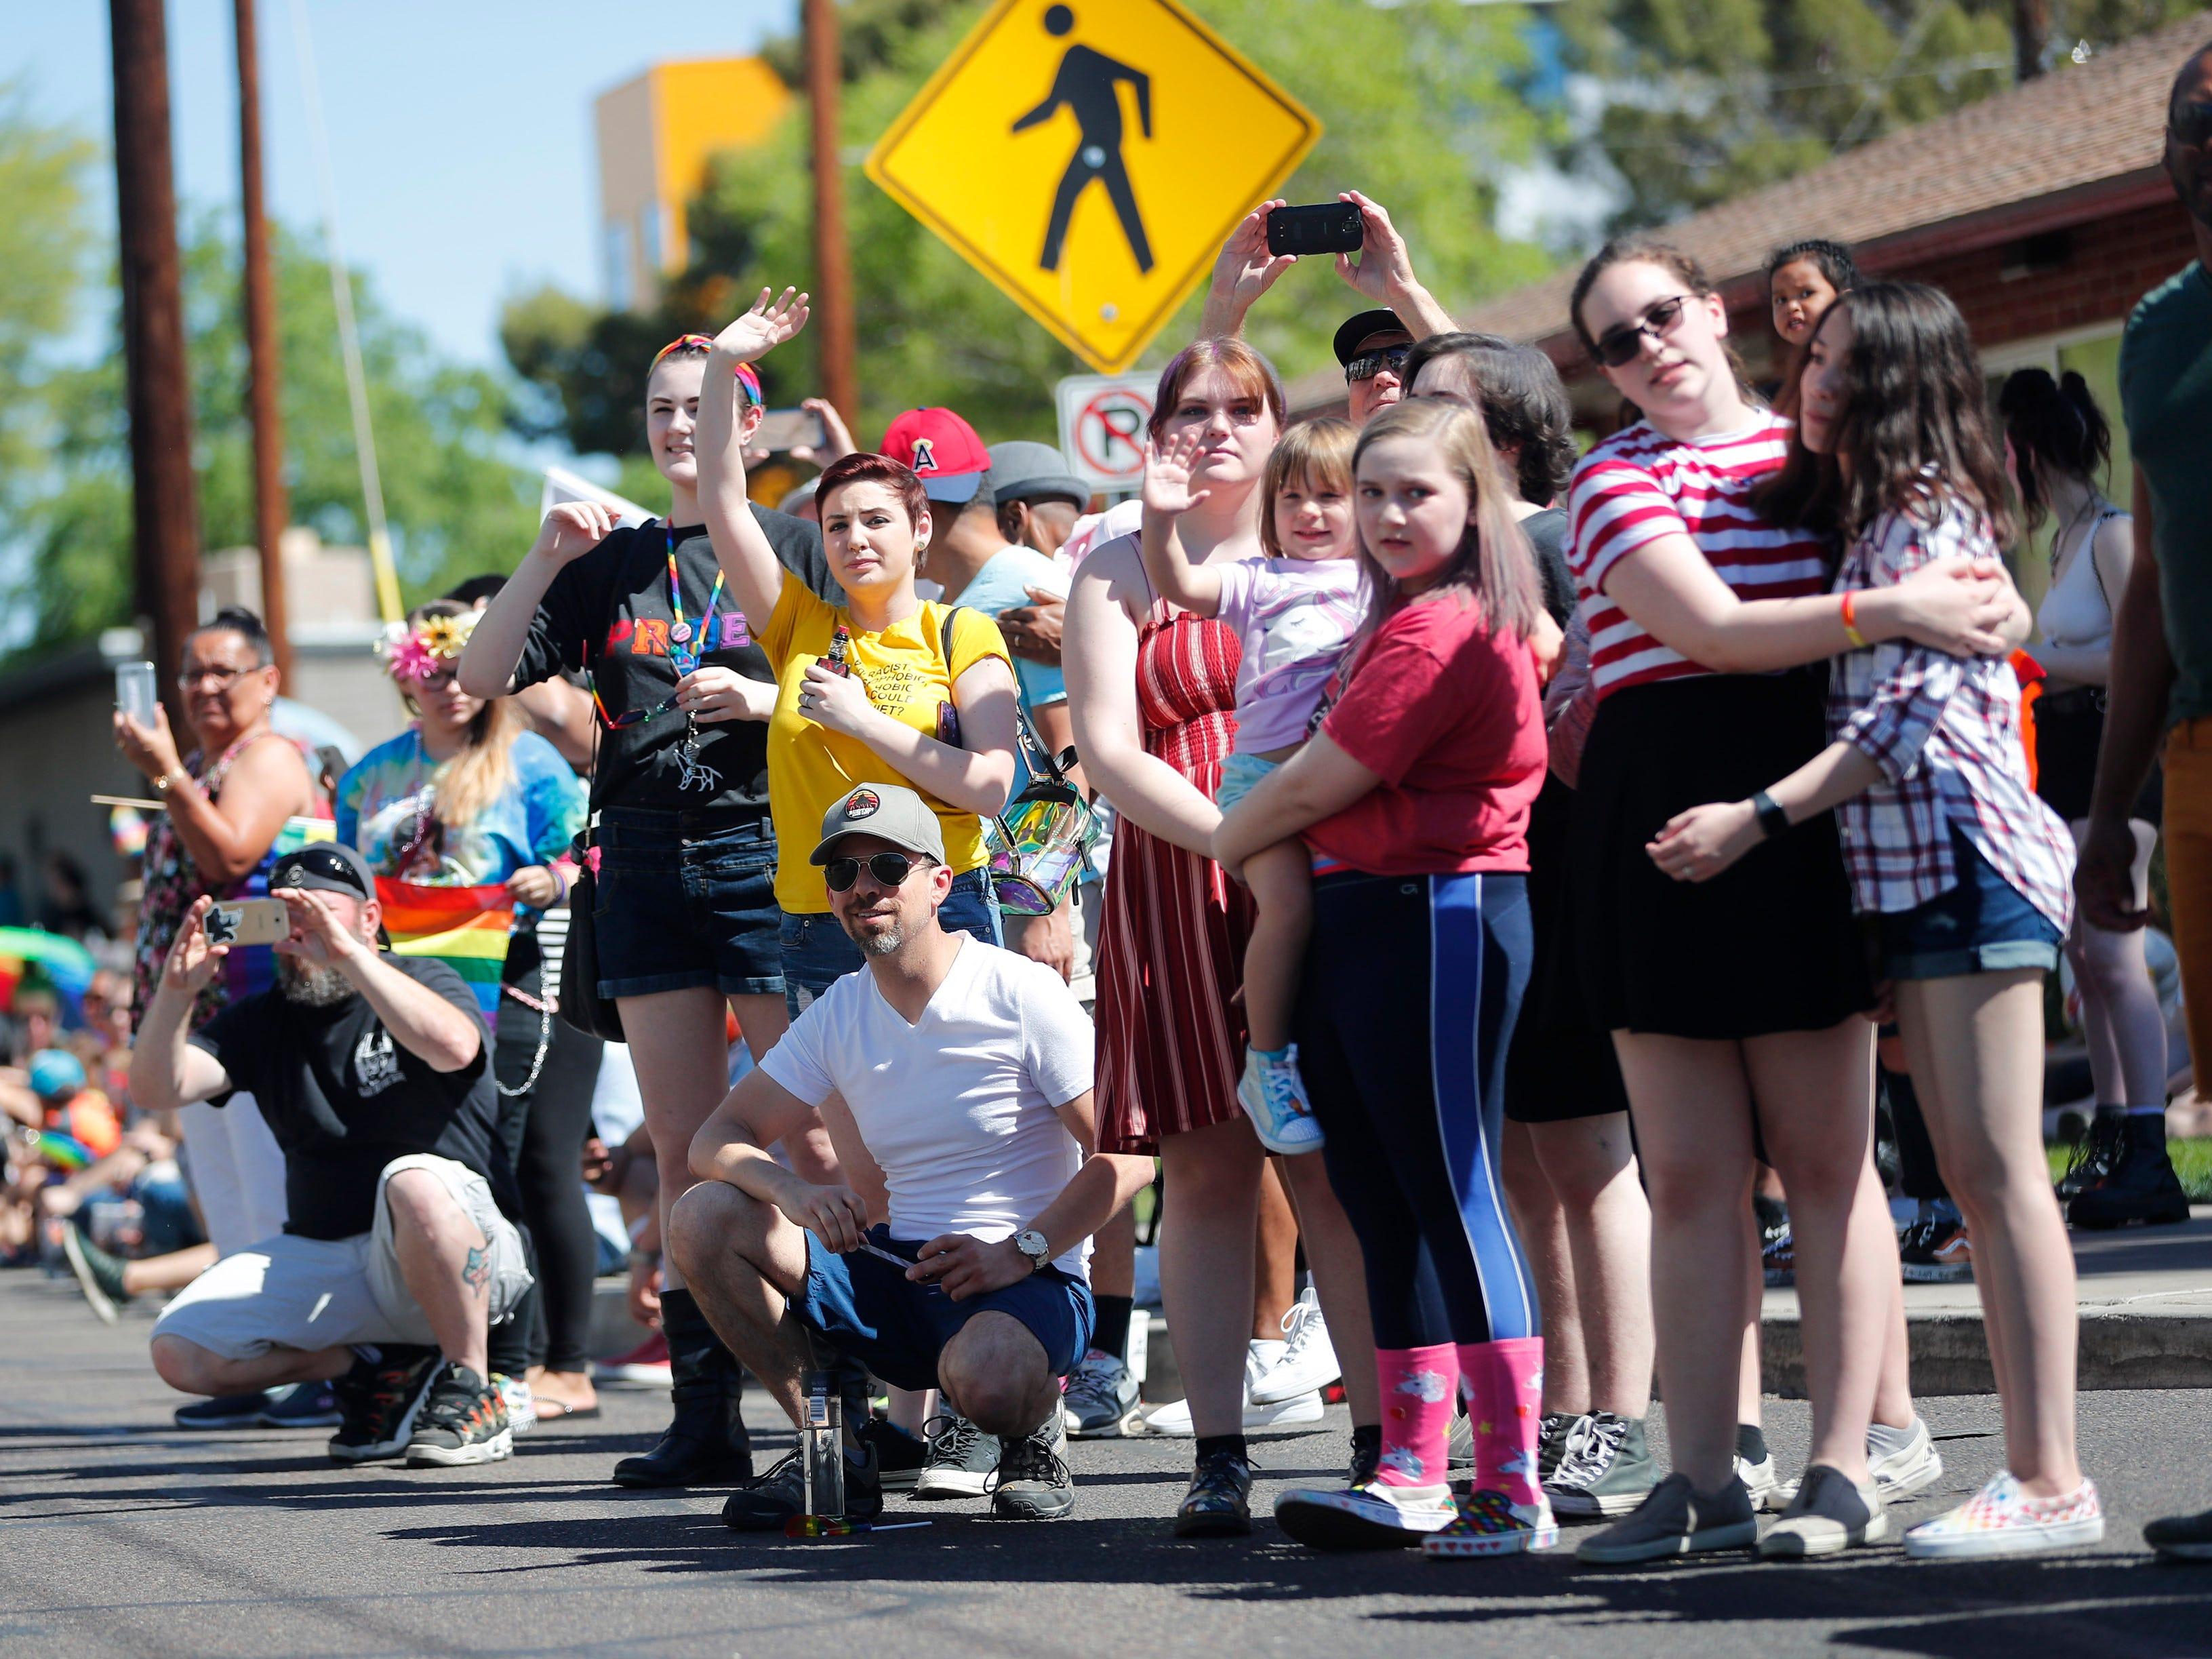 Spectators watch the Phoenix Pride Parade on April 7, 2019.